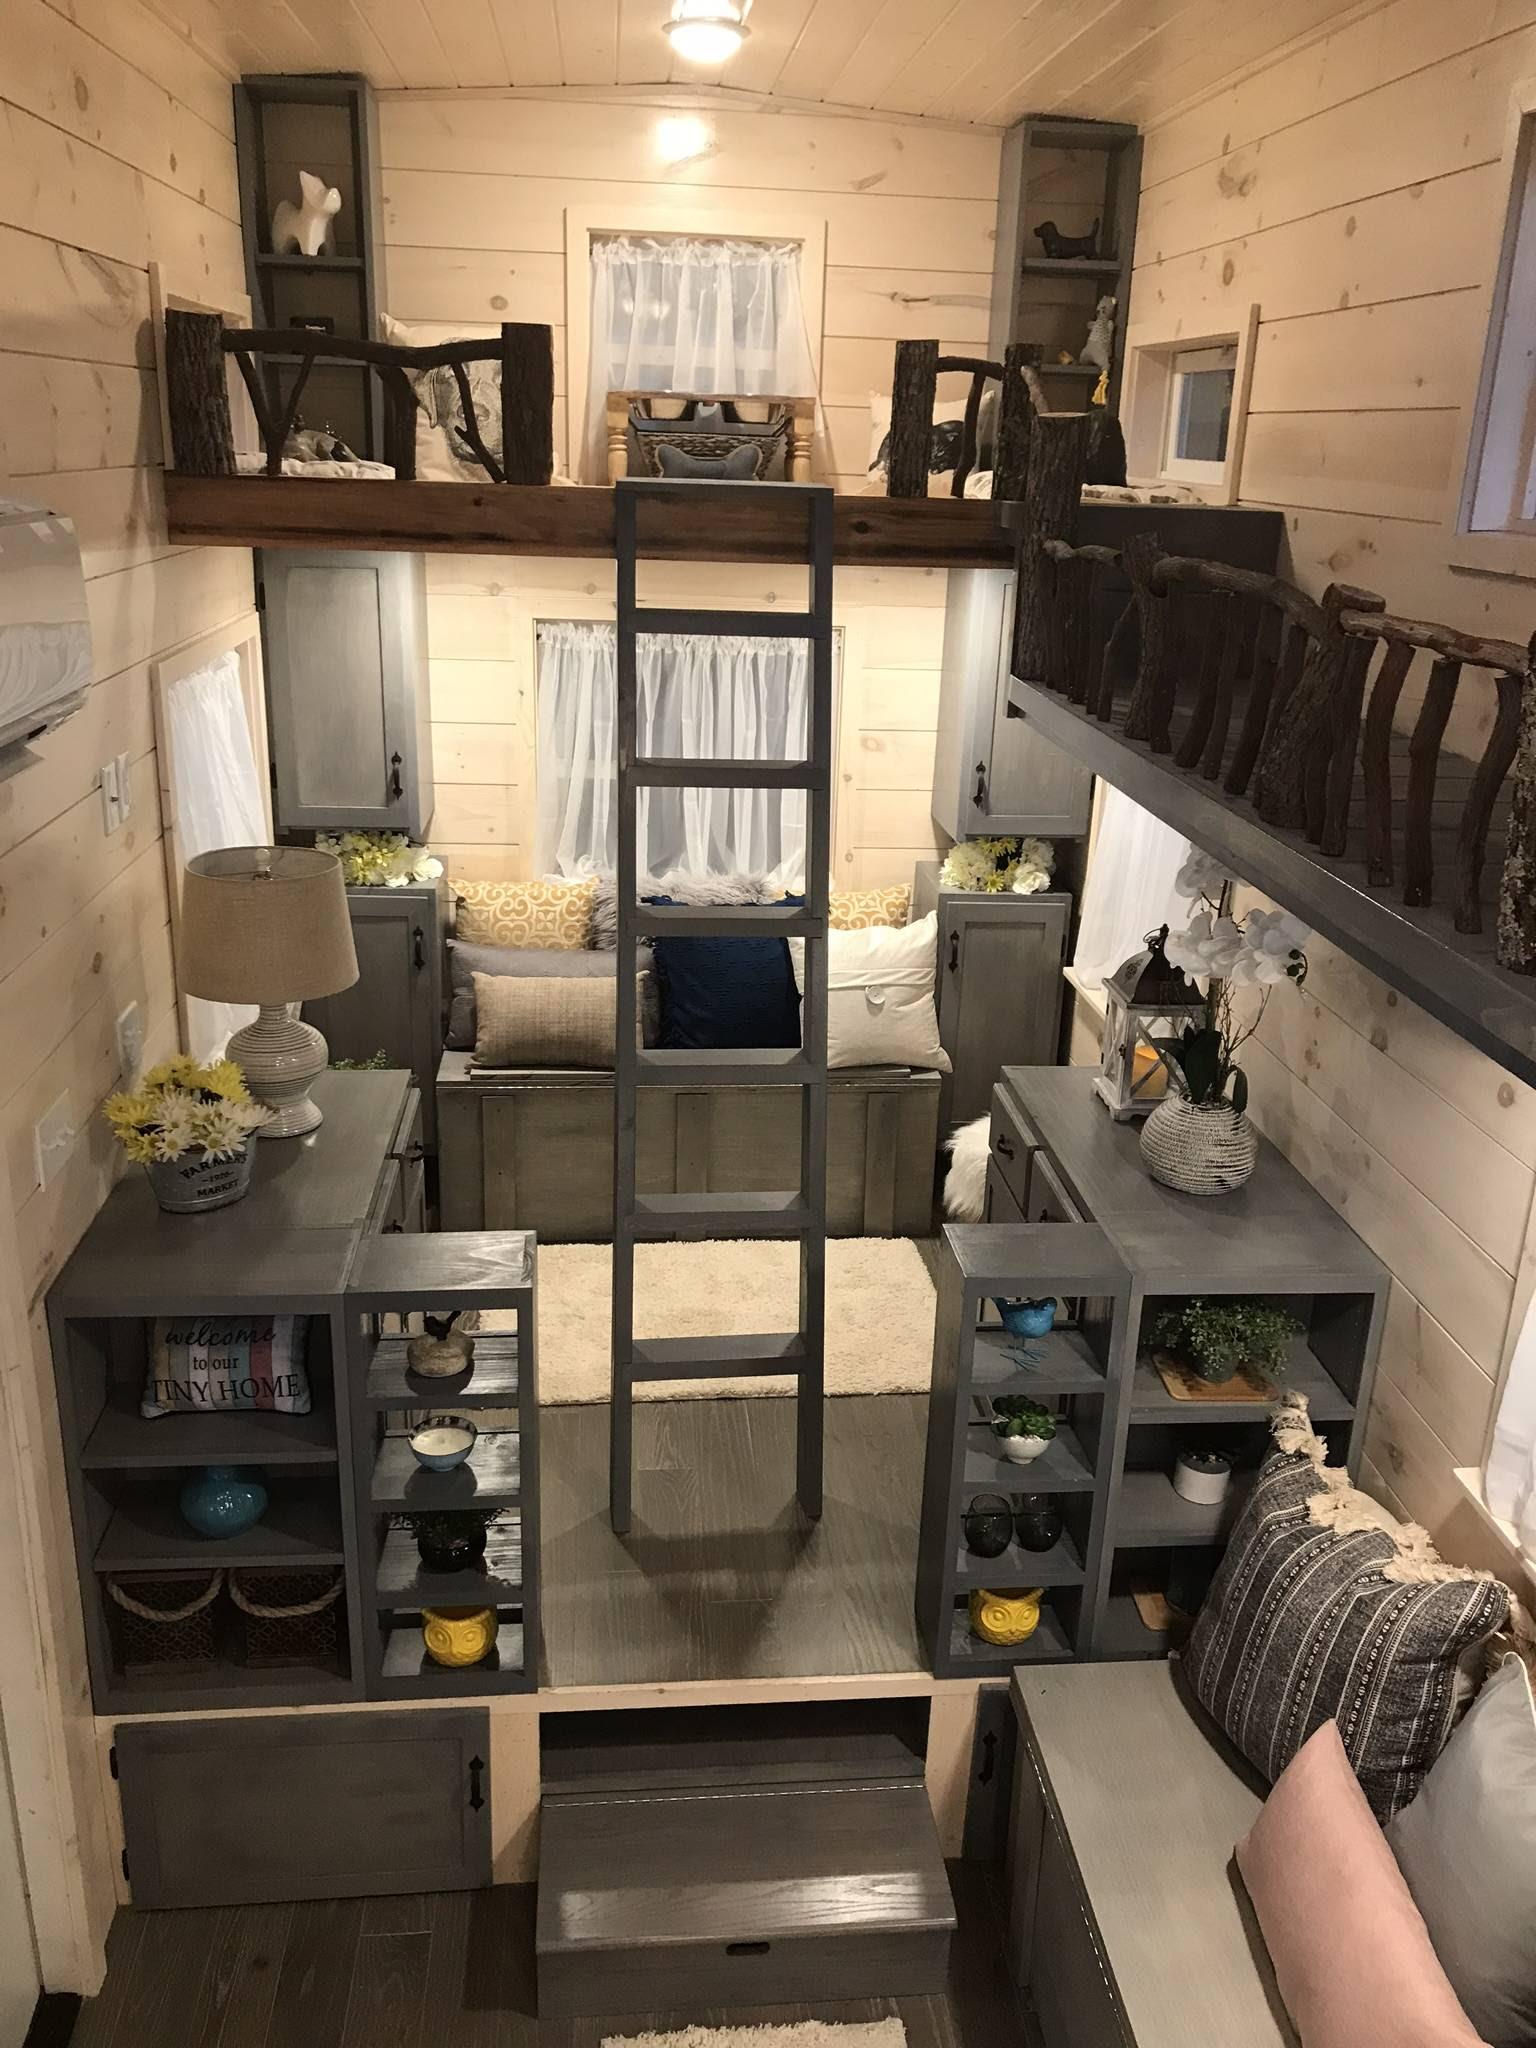 Tiny Homes For Sale Starting At 20k Custom Built Tiny House